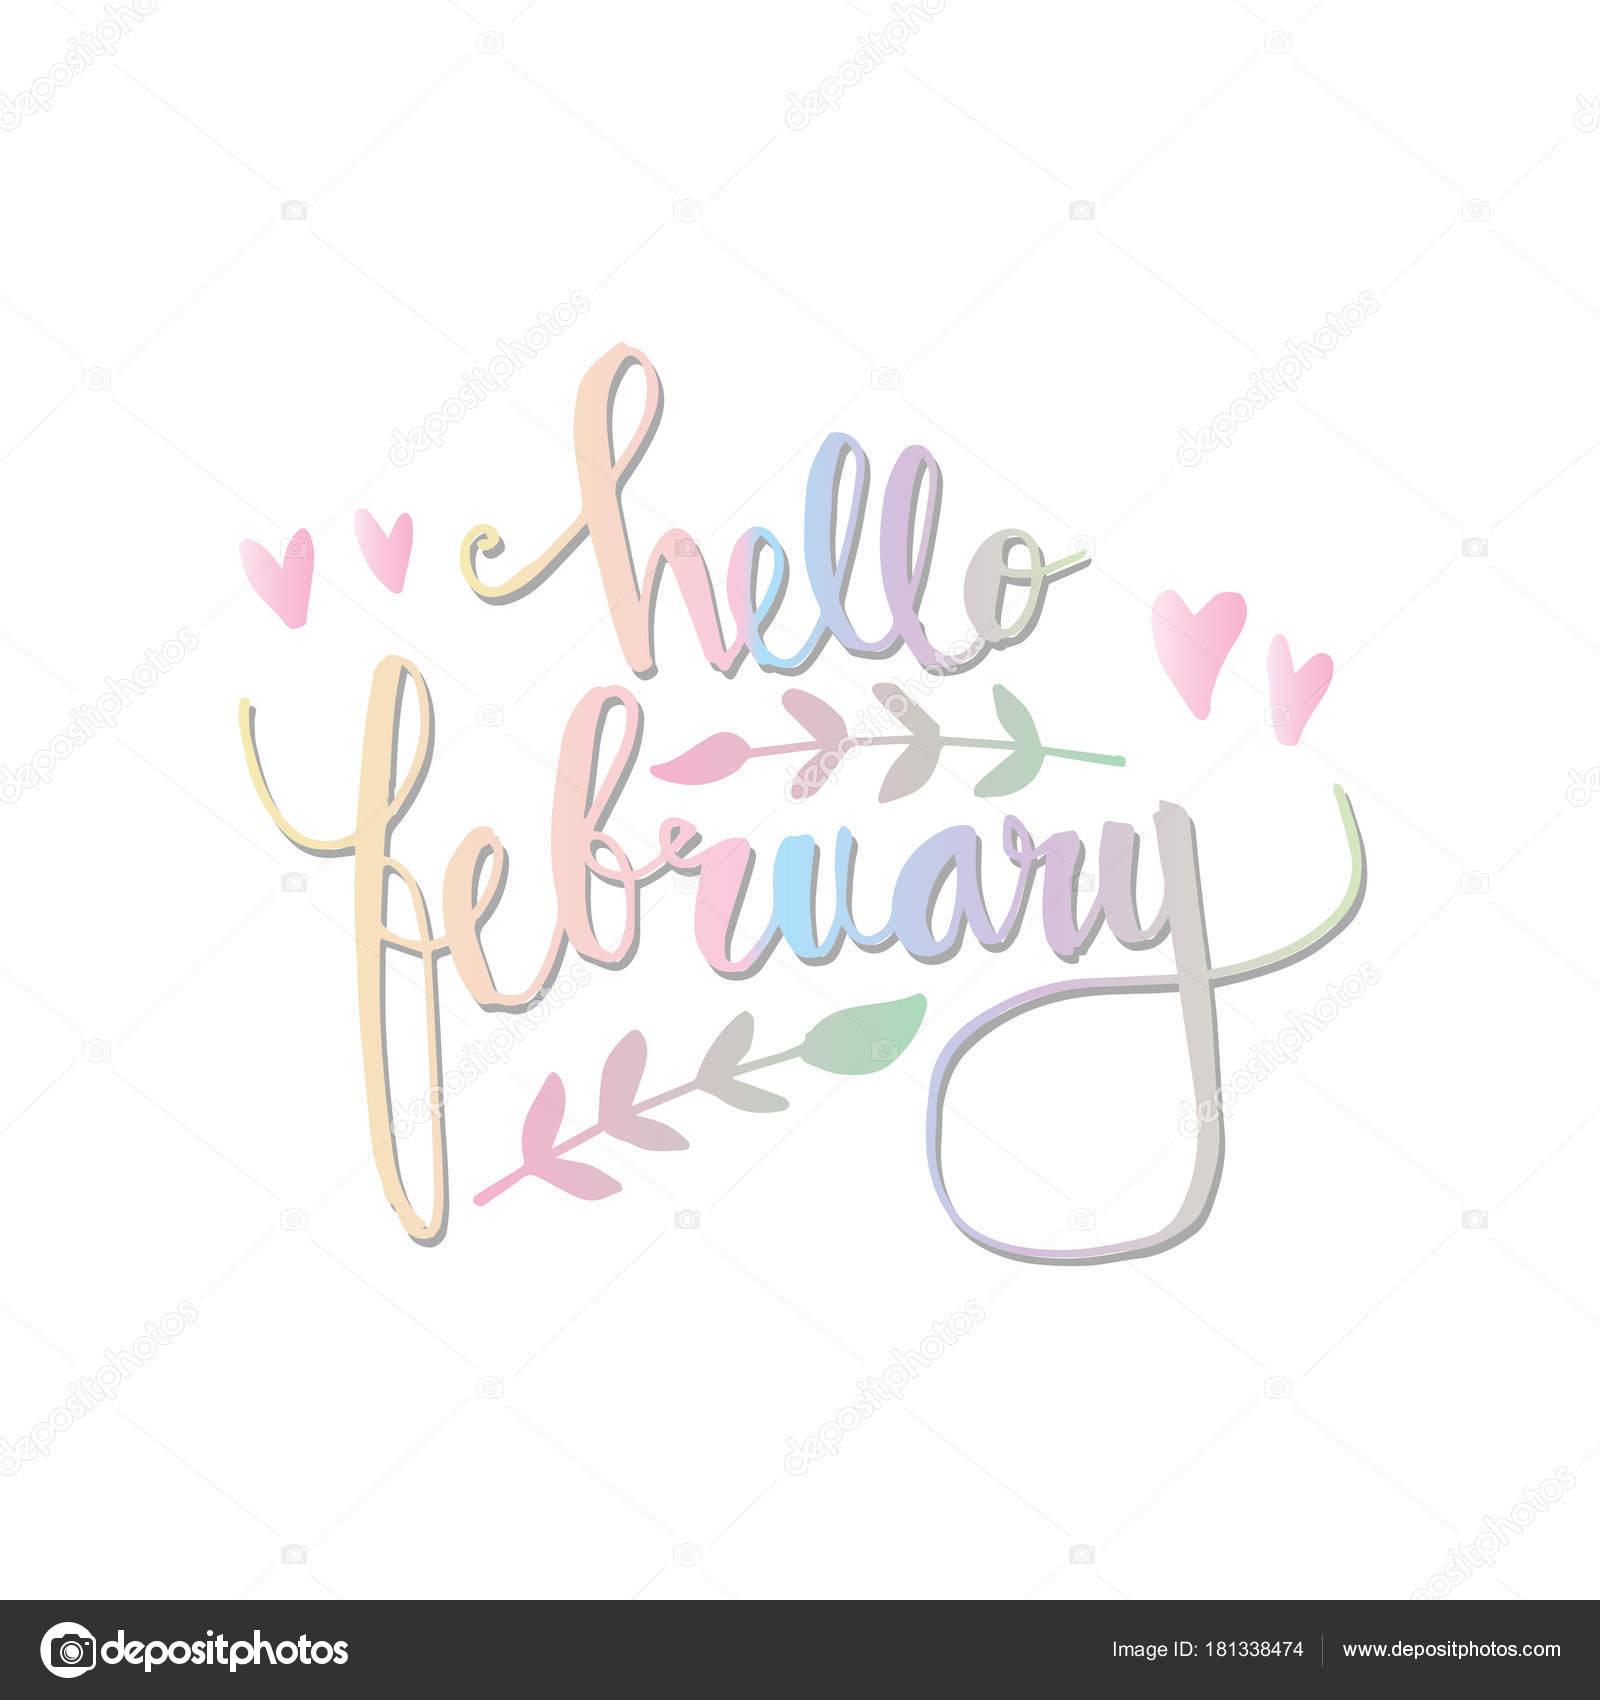 Hello February Hand Lettering — Stock Photo © Handini #181338474